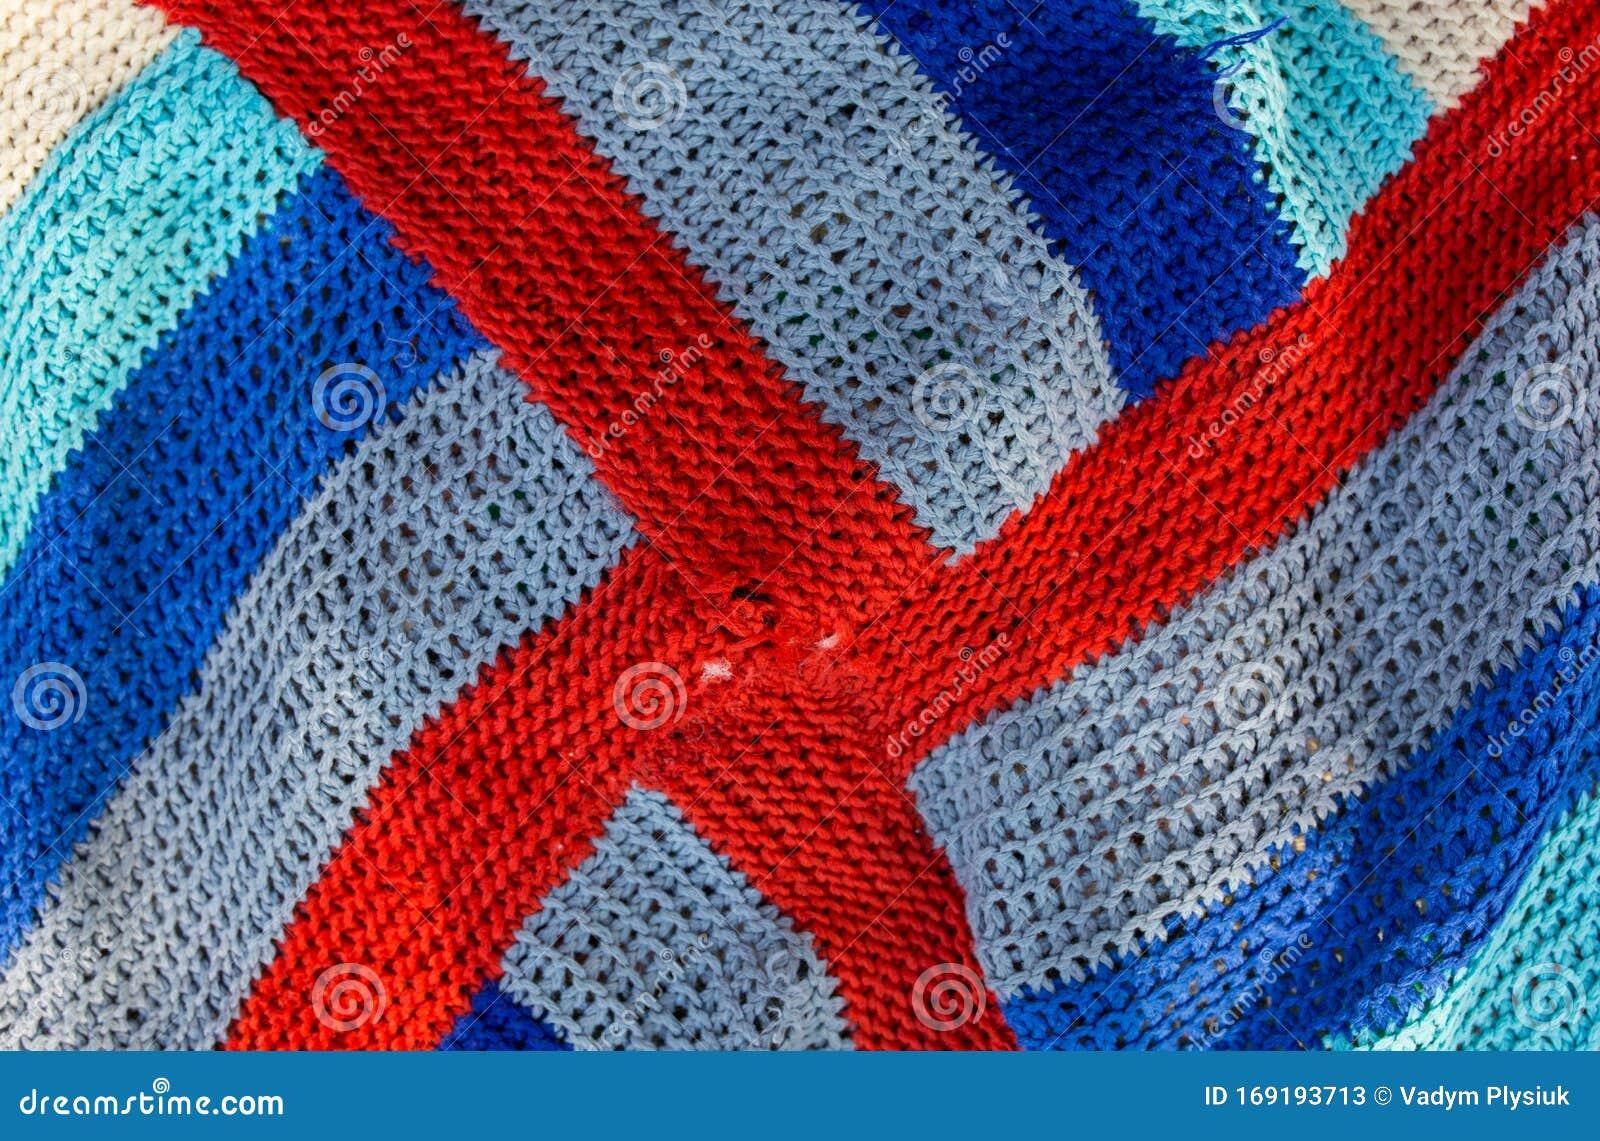 Handmade Bright Knitted Hippie Pattern Cloth Texture ...